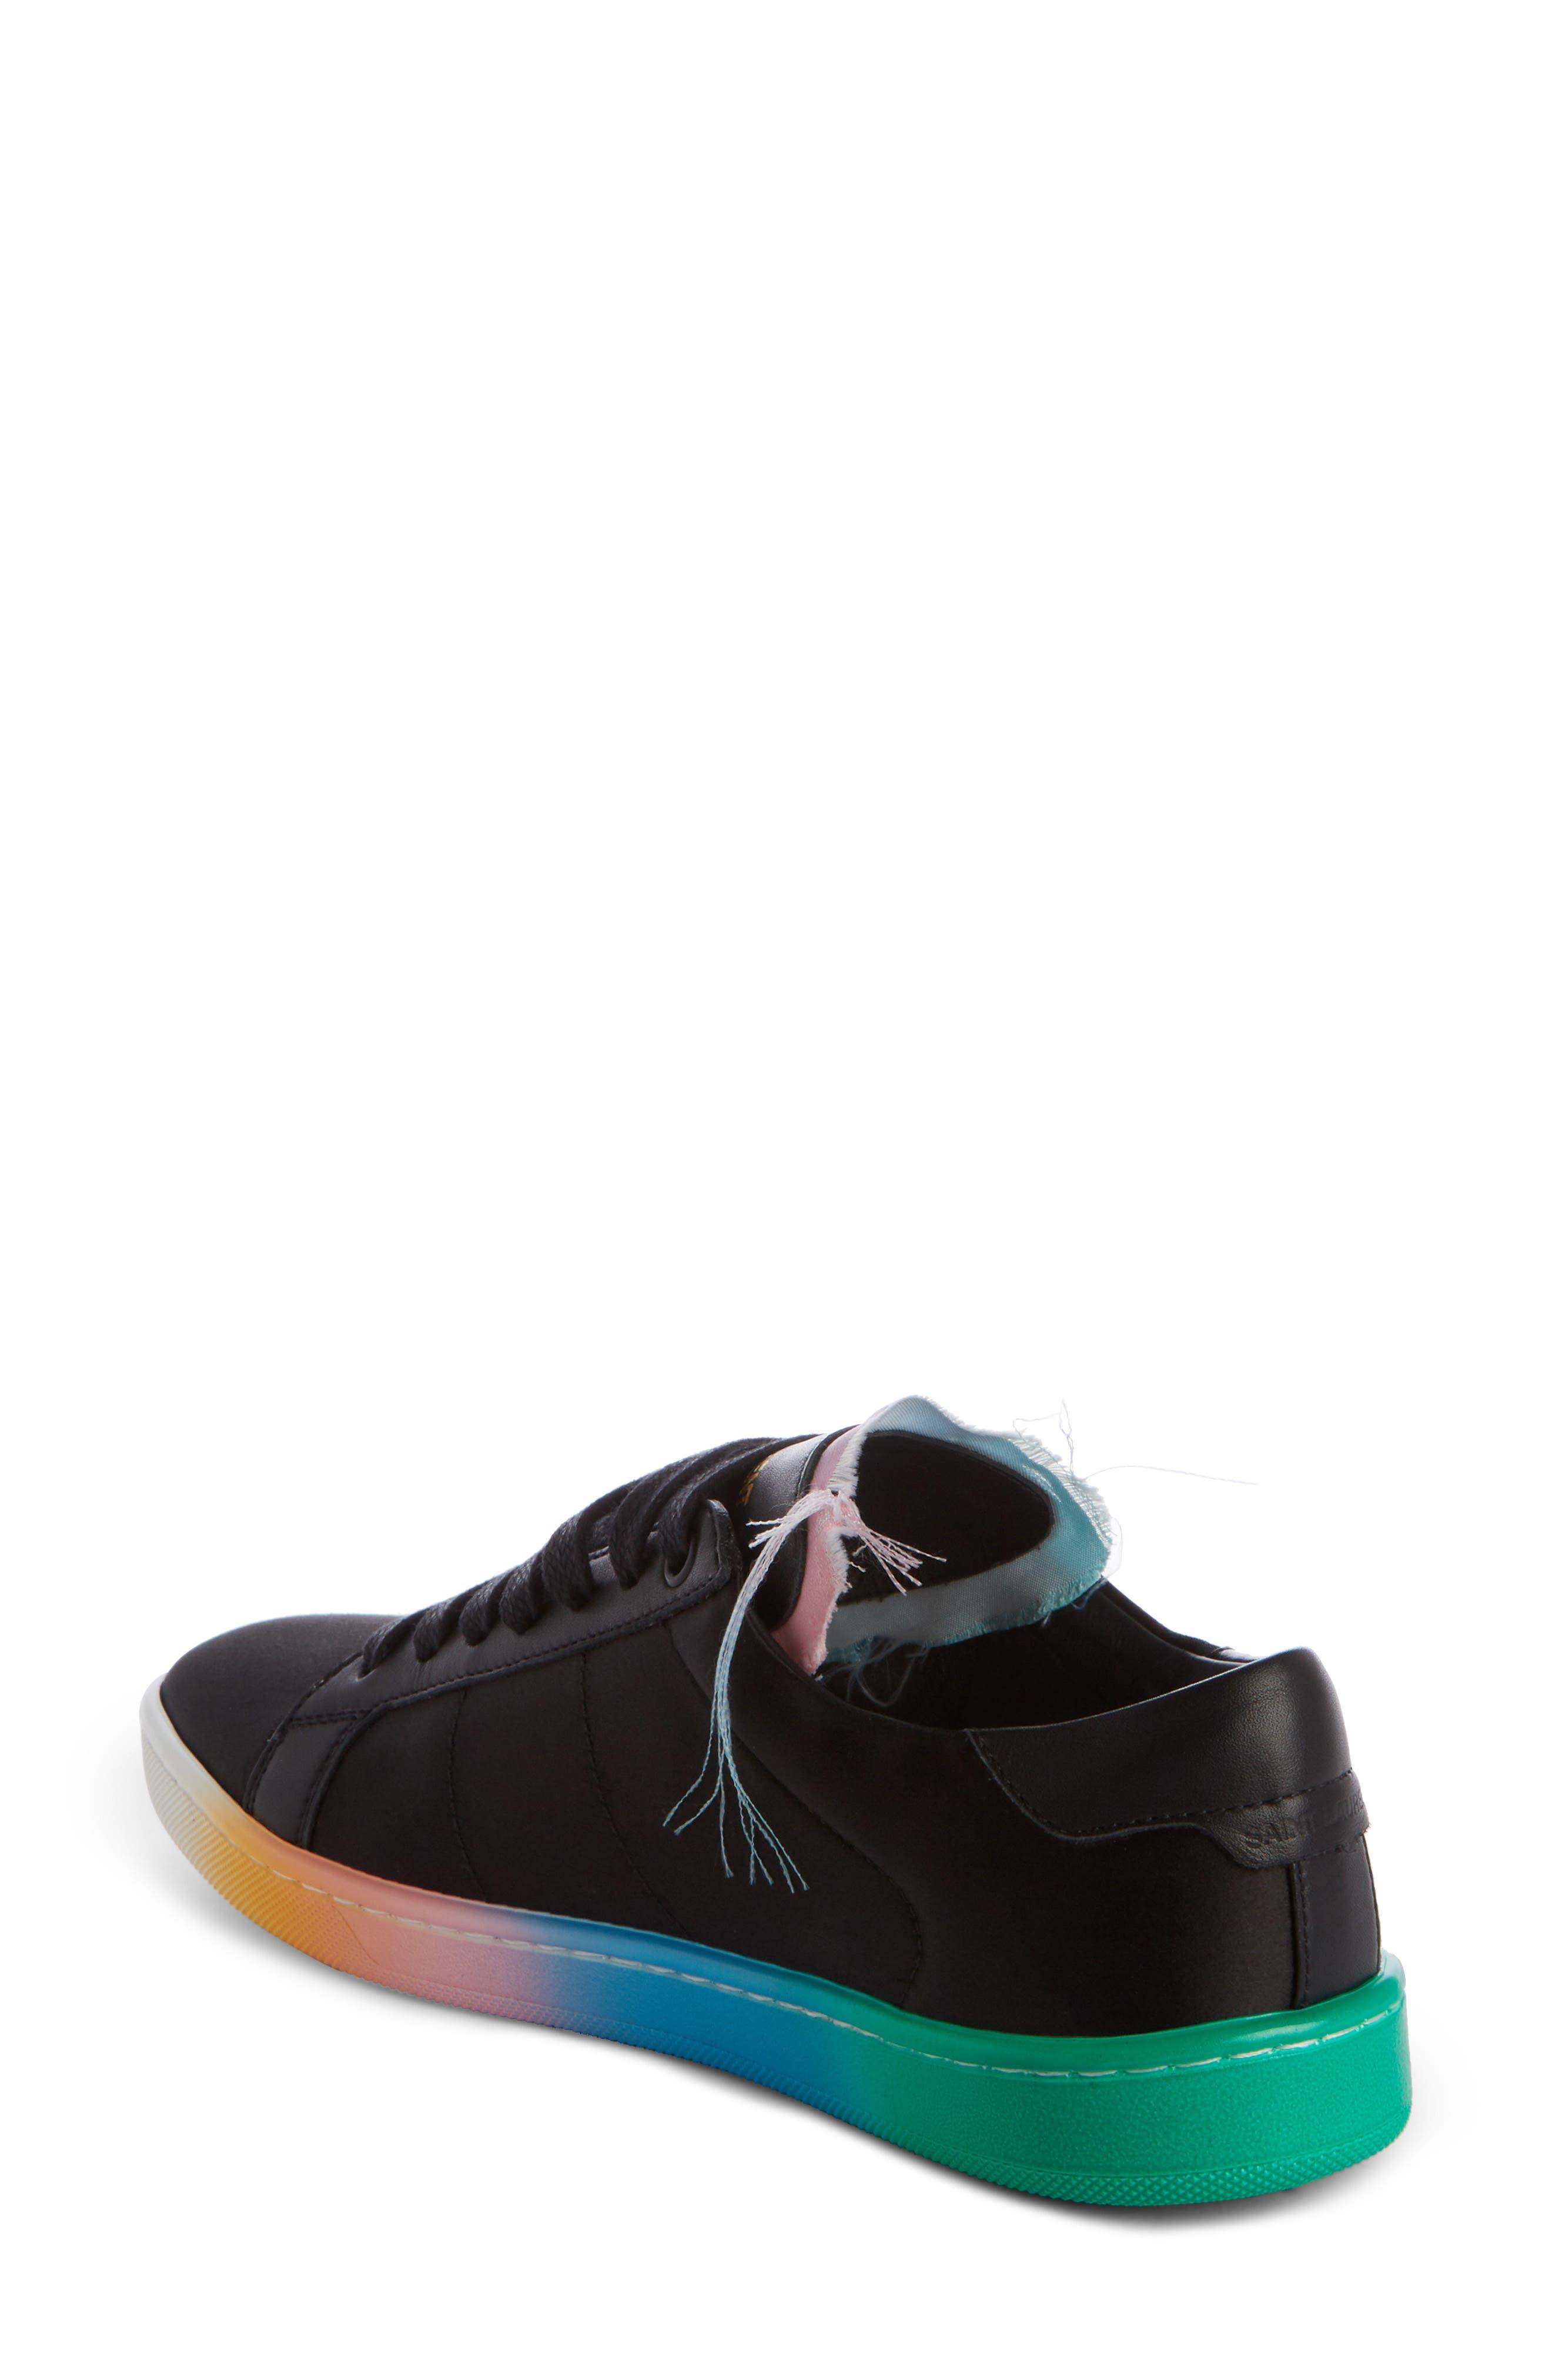 Court Classic Rainbow Sole Sneaker,                             Alternate thumbnail 2, color,                             001